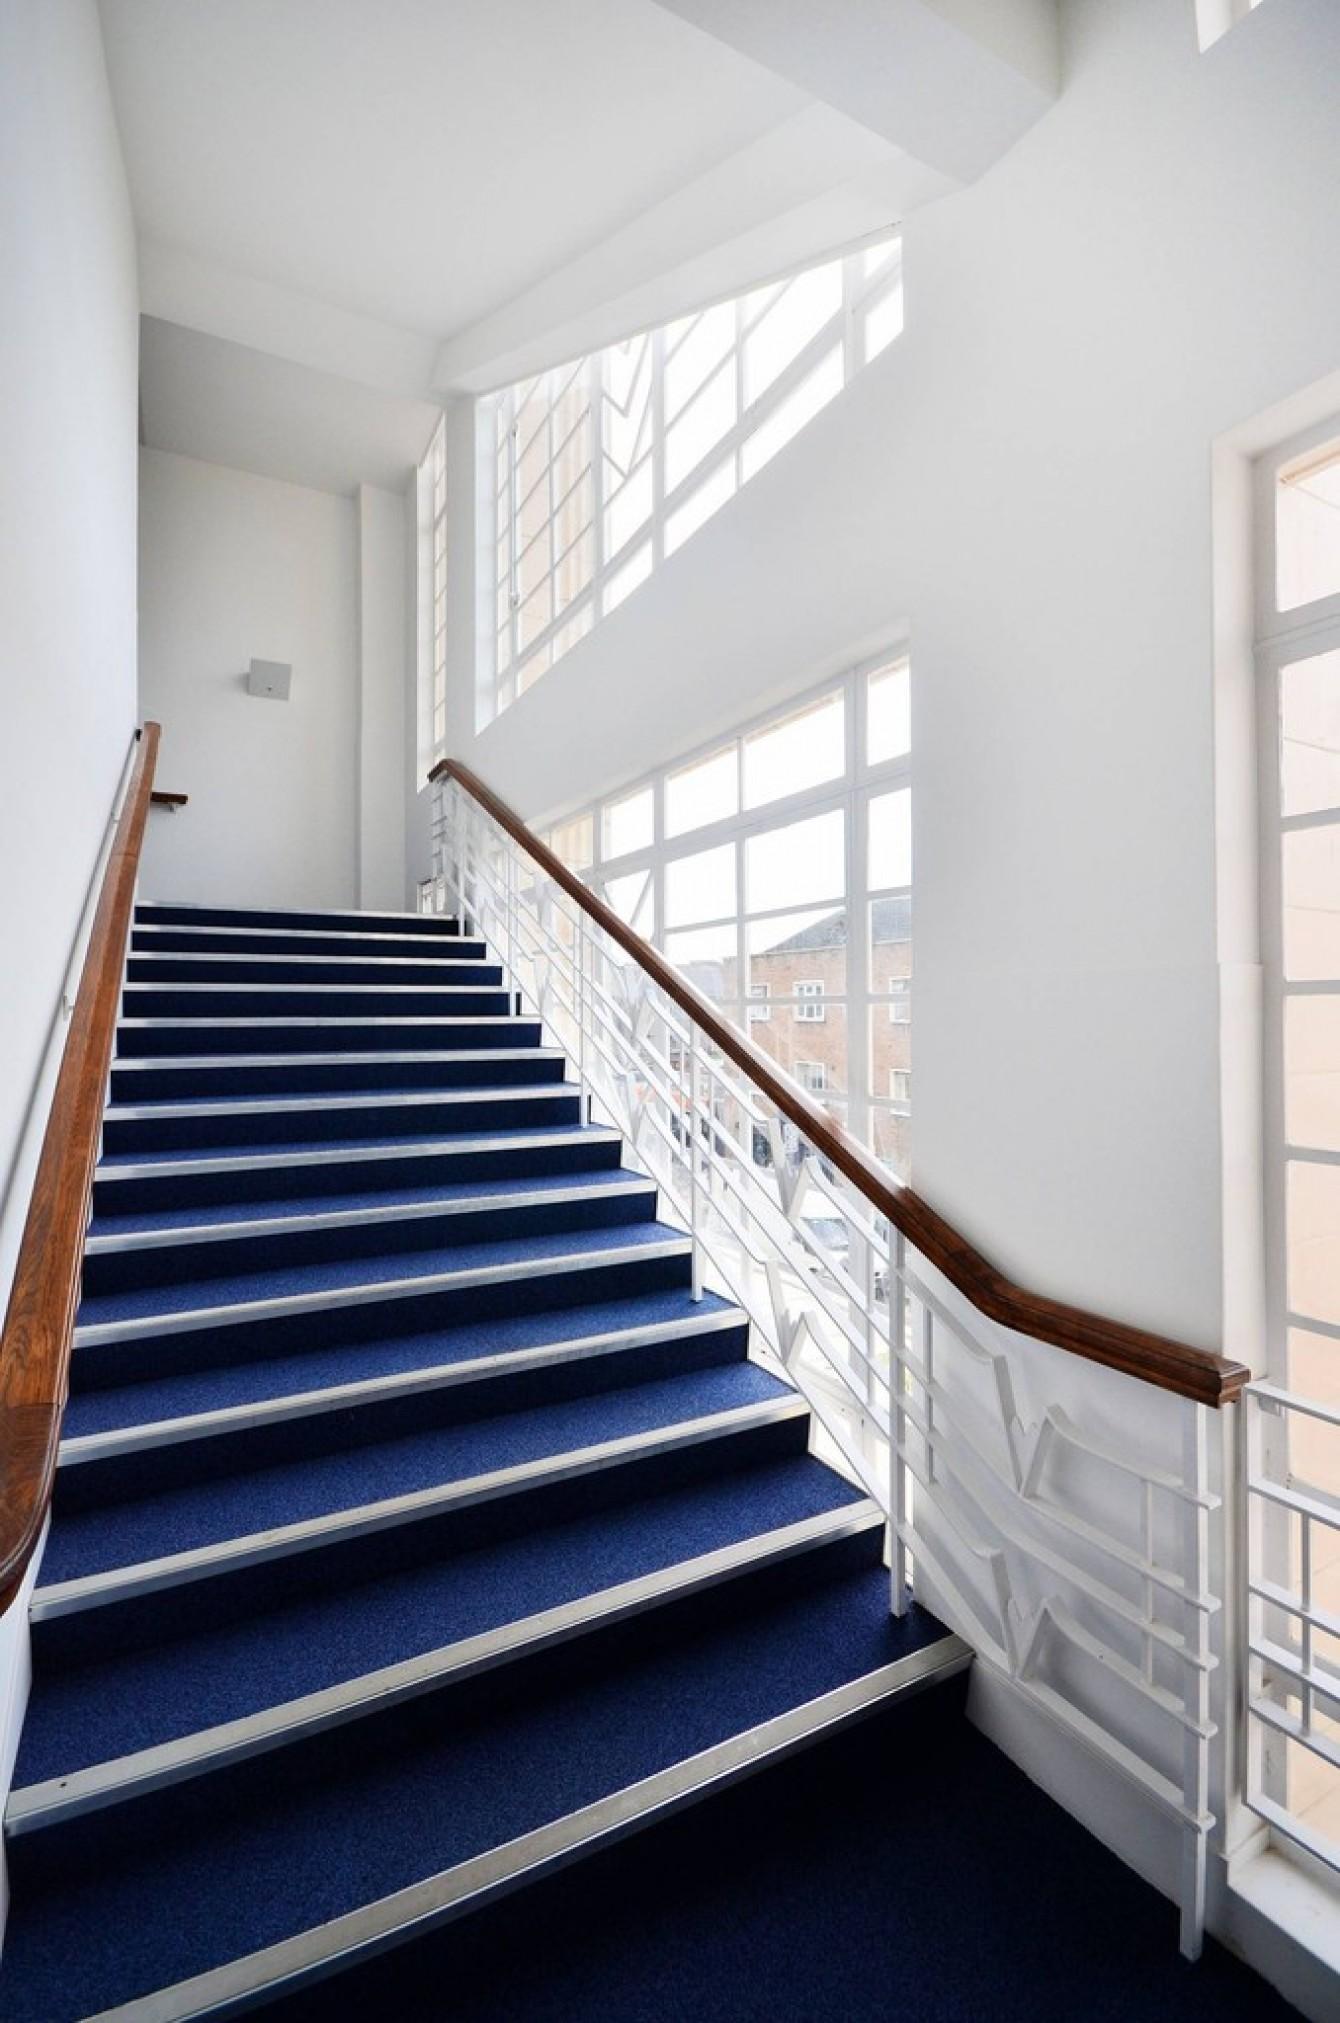 Images for Axminster Road, Islington, London EAID:c8d5f0ae42d594d169bca90f3b8b041a BID:1